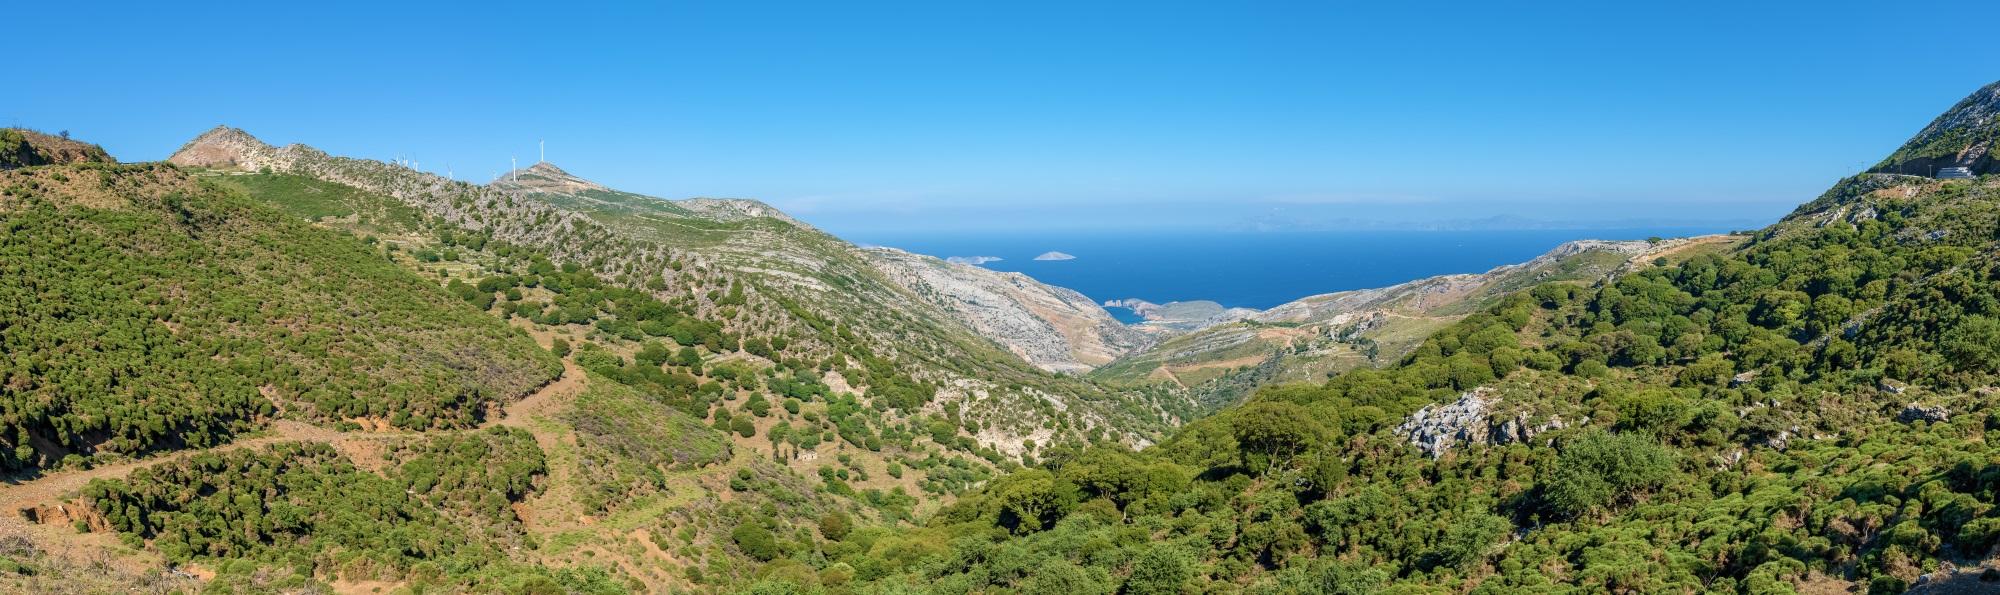 Naxos Natur